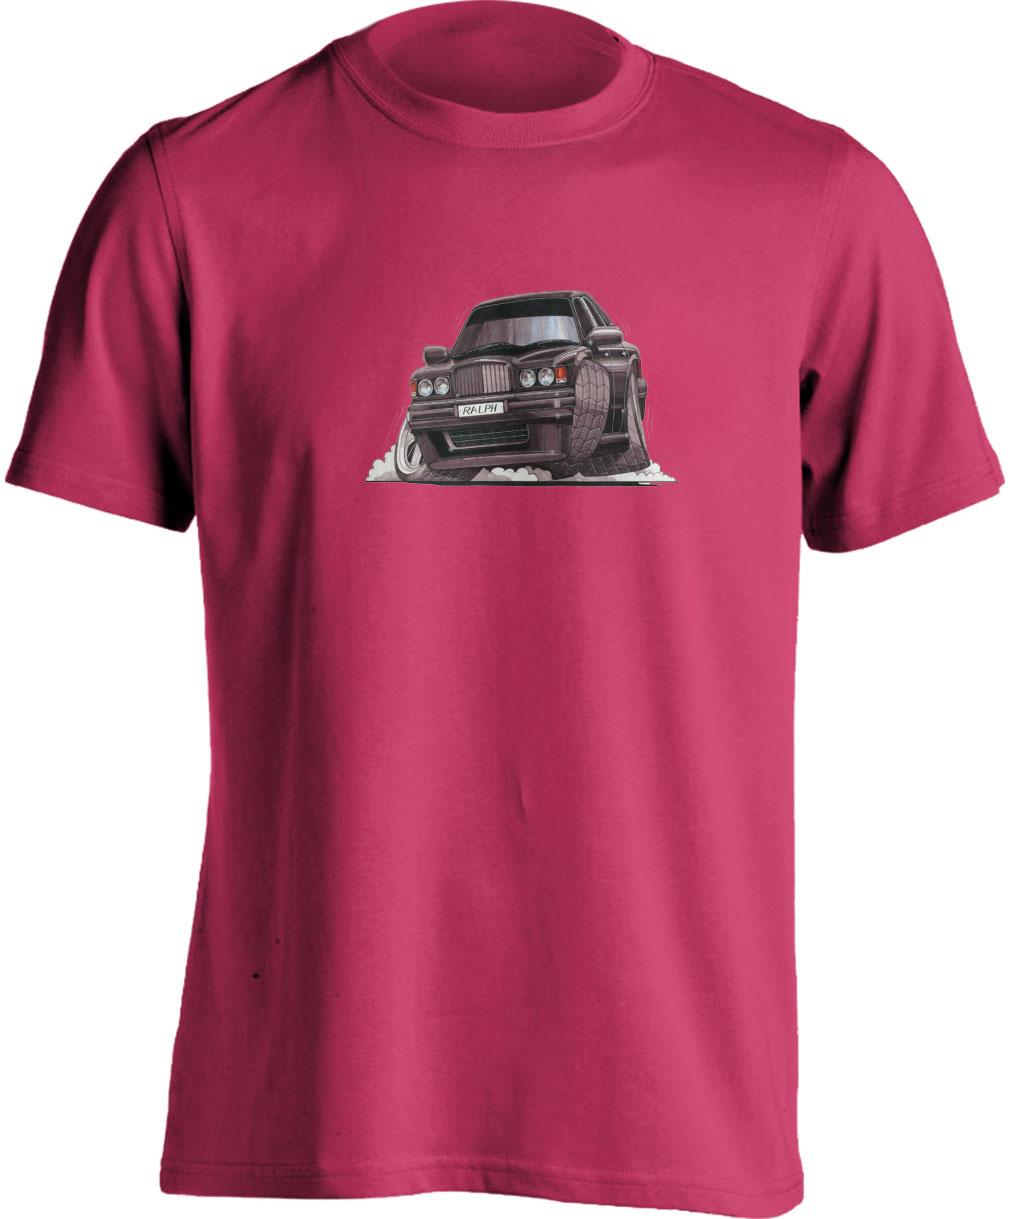 Koolart Bentley Type R Turbo Black-0673-Child's Unisex T Shirt